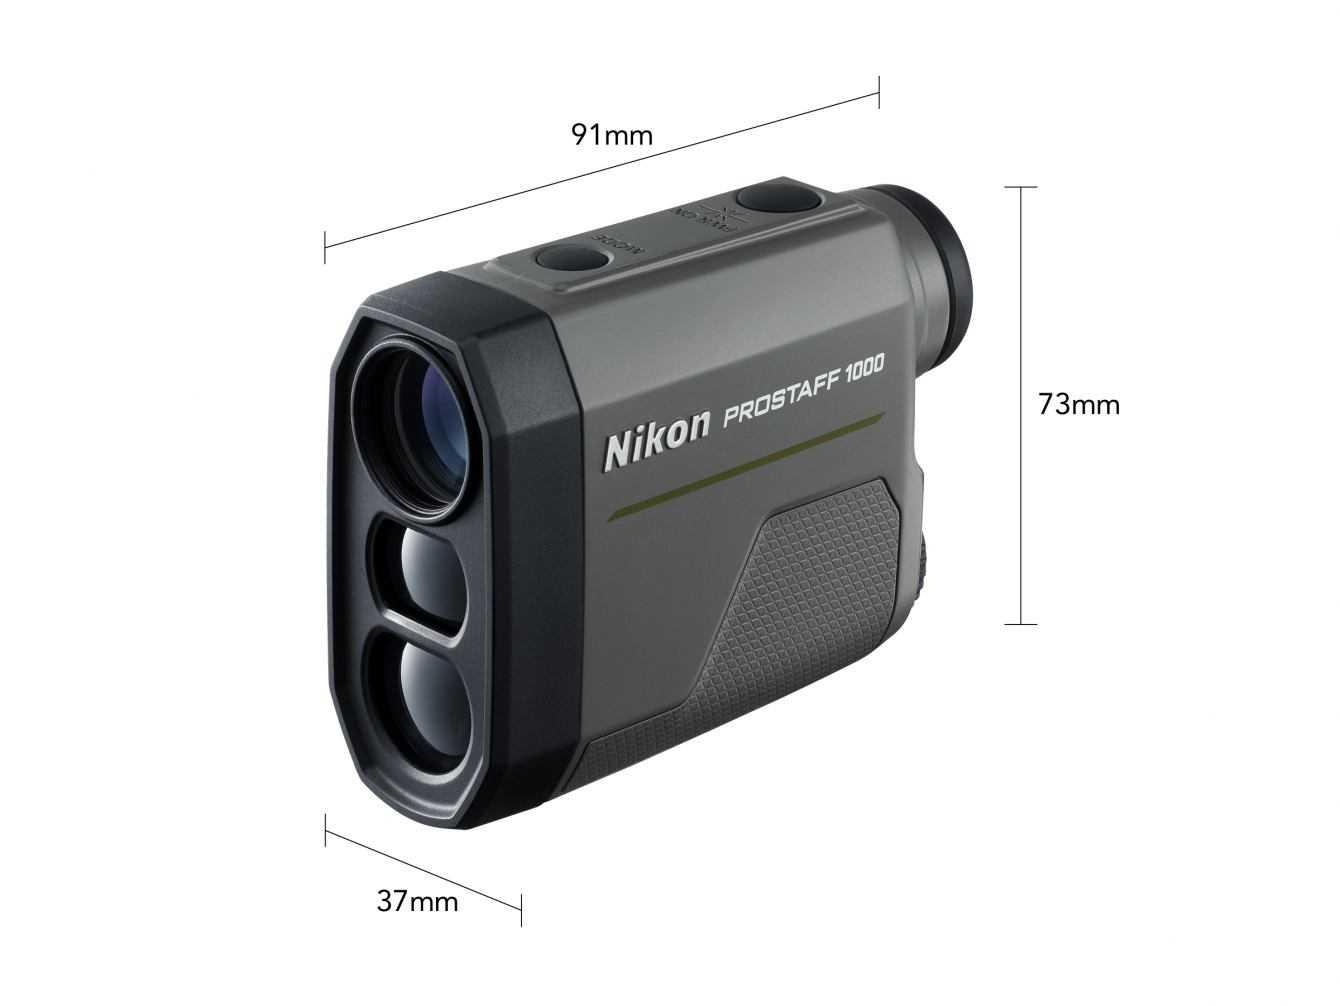 Nikon presenta PROSTAFF 1000: il telemetro laser pronto a tutto!